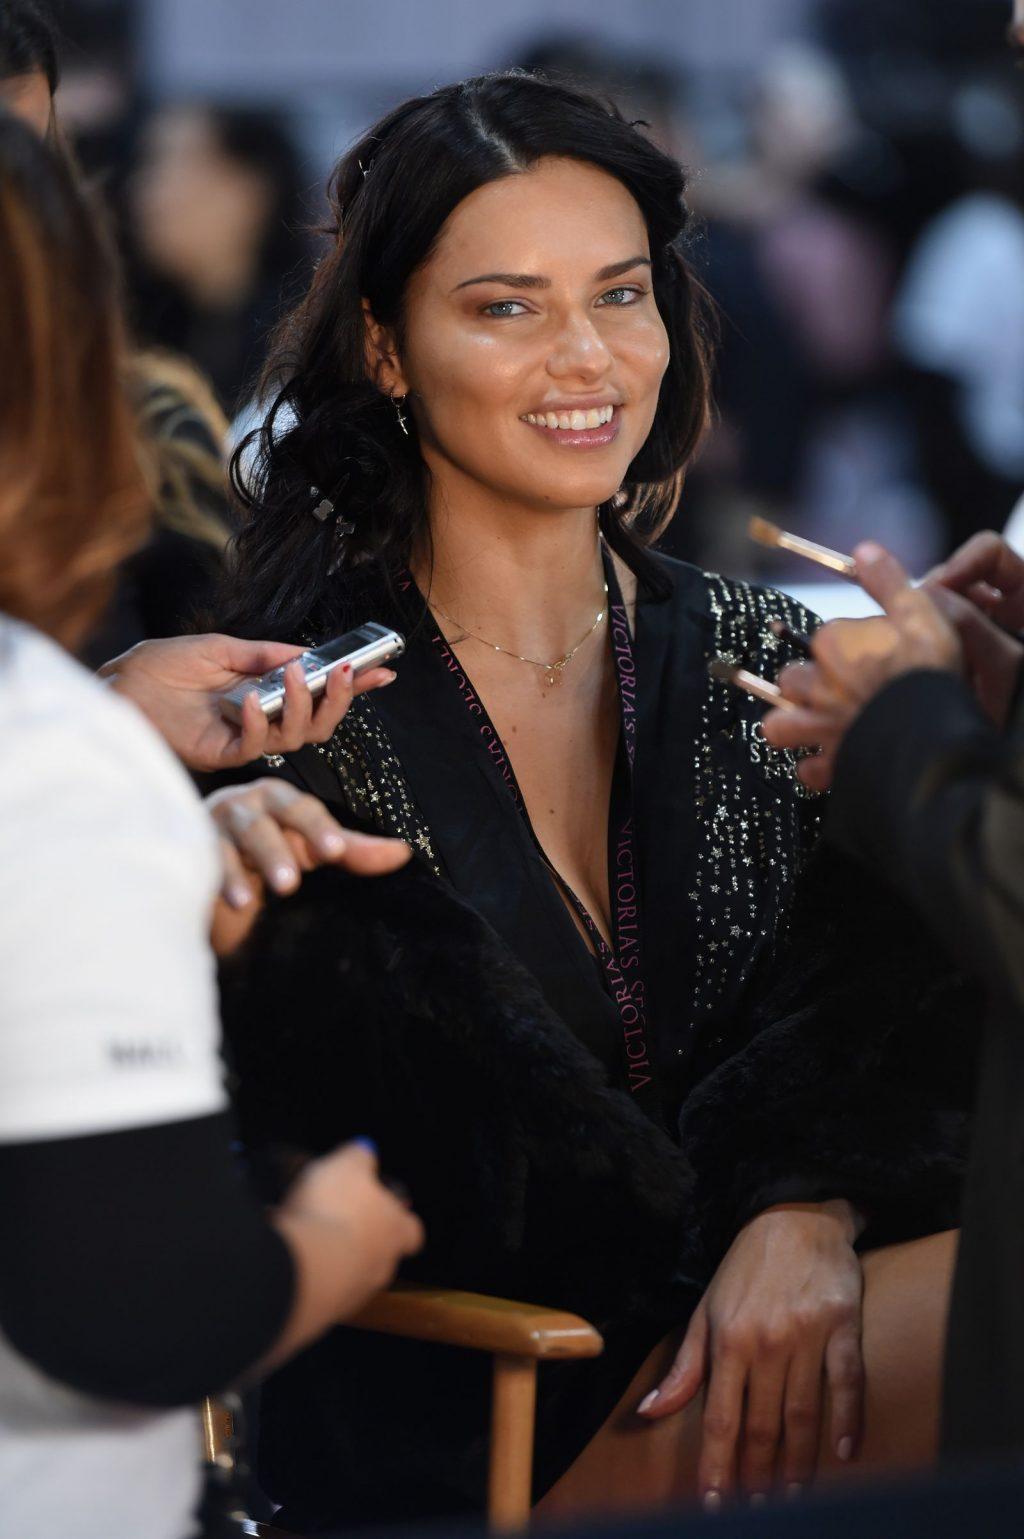 siêu mẫu Adriana Lima 13